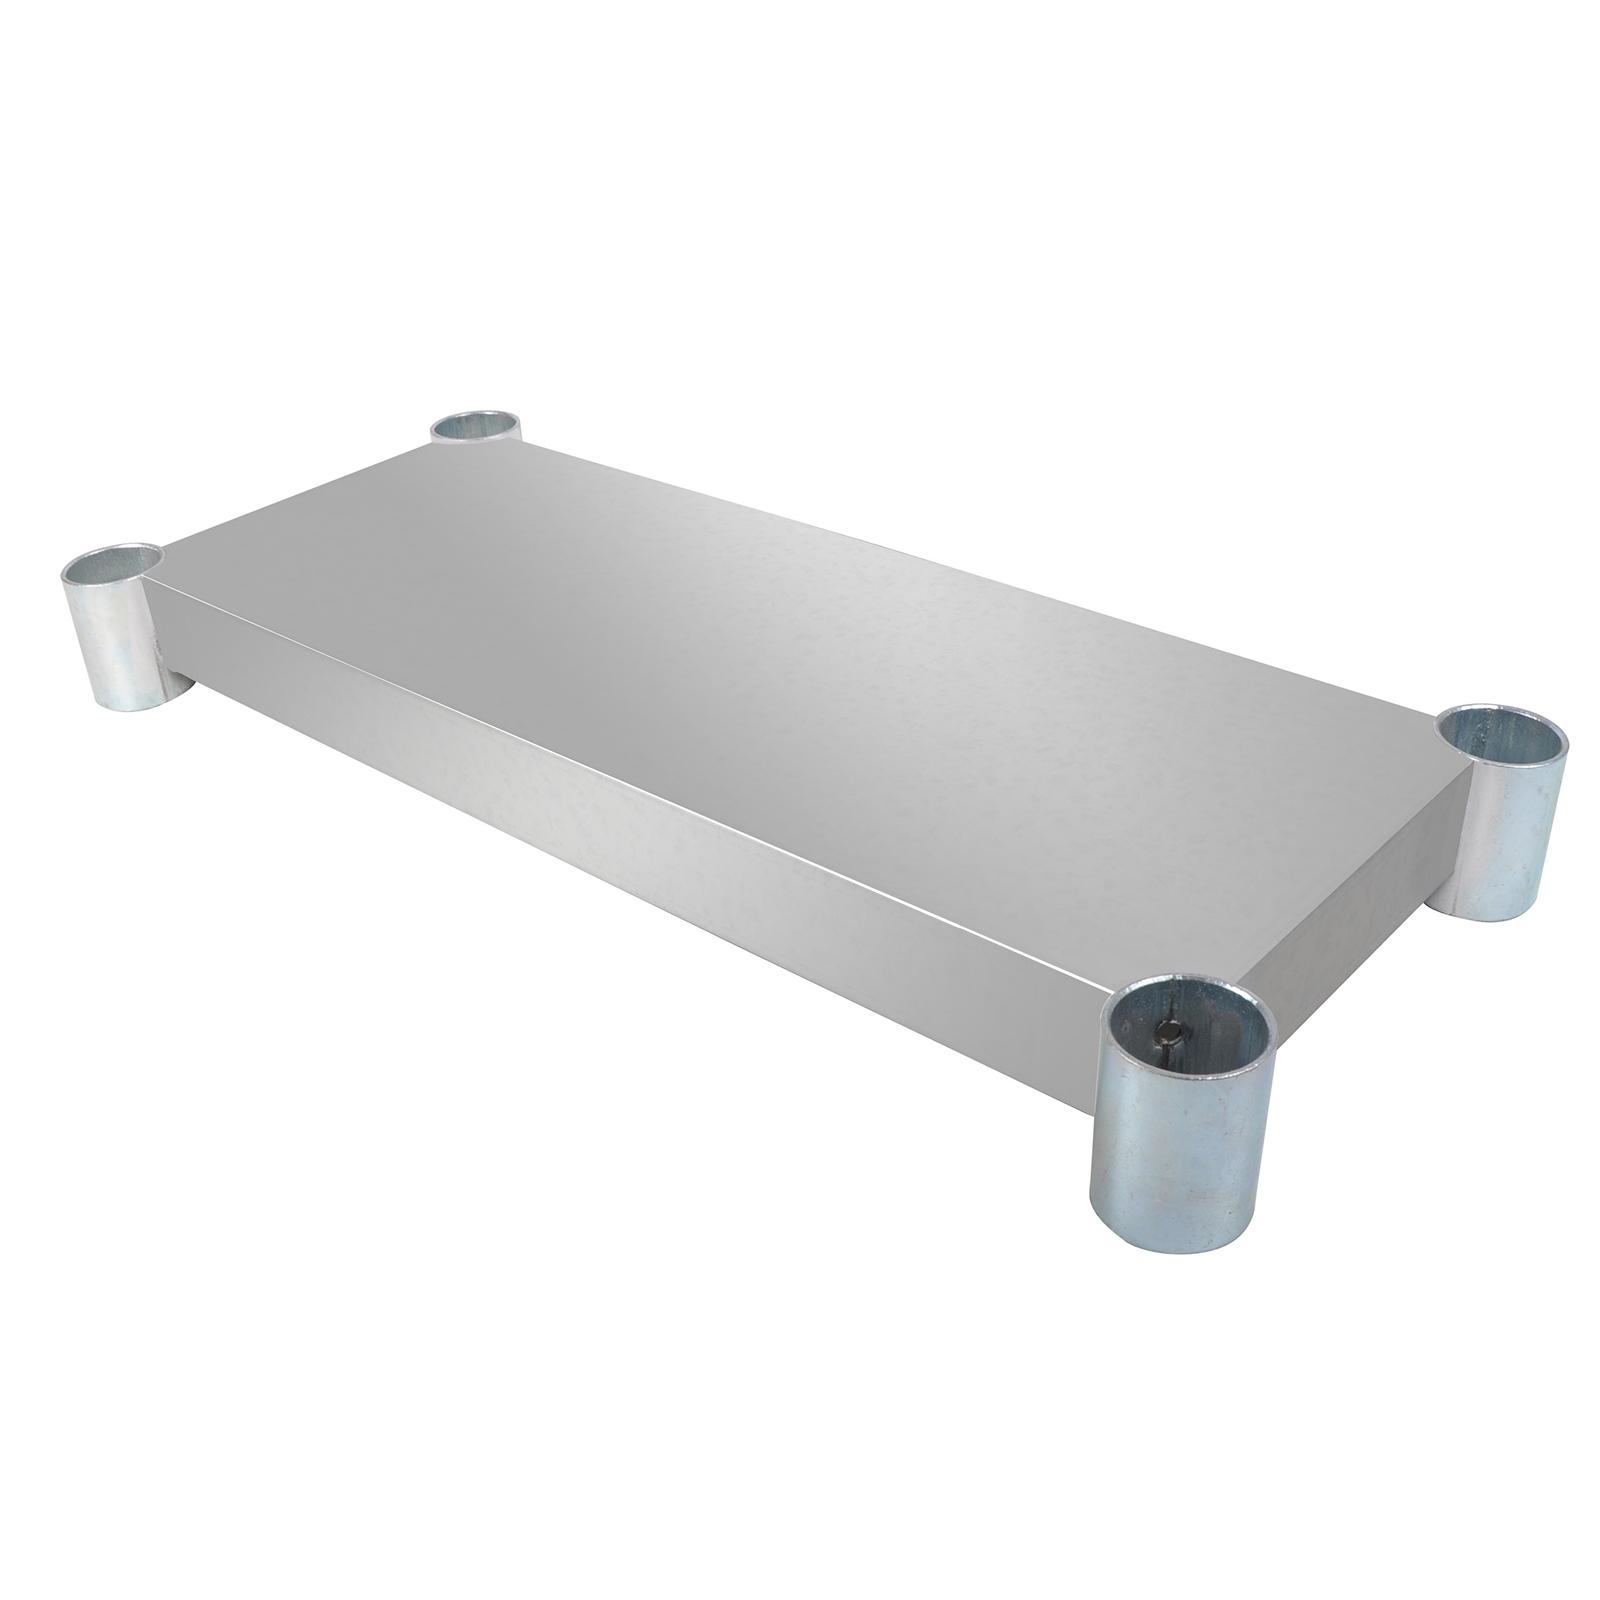 BK Resources SVTS-6024 work table, undershelf